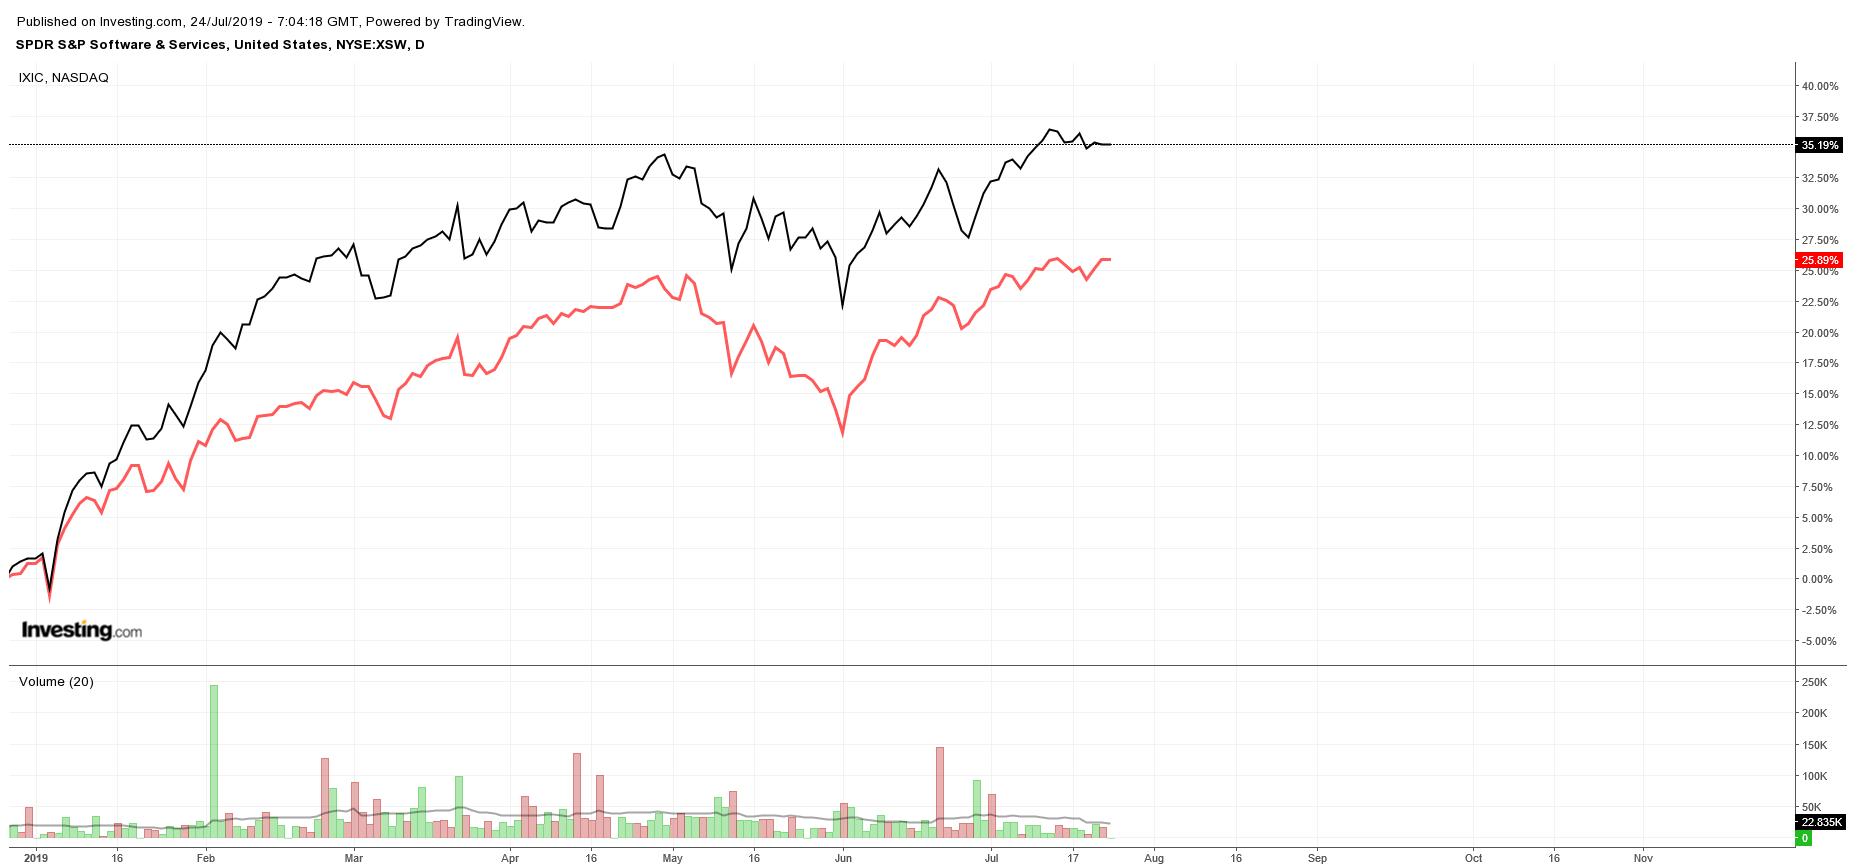 SPDR S&P Software & Services ETF vs. Nasdaq